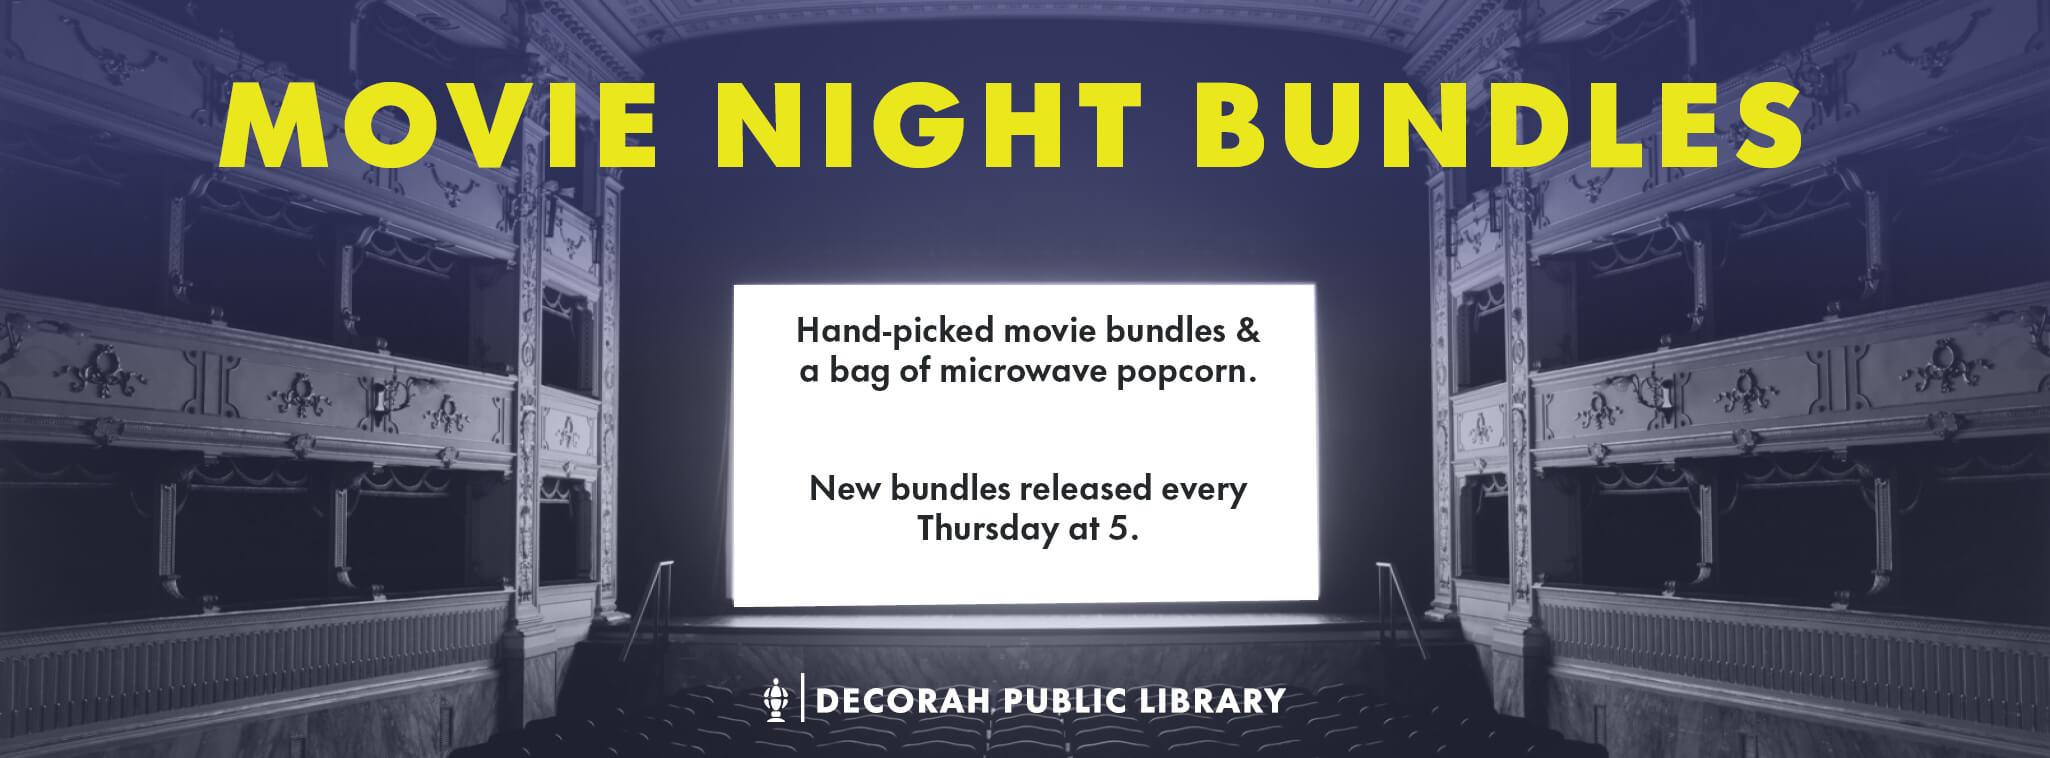 Movie Night Bundles Banner Decorative Image